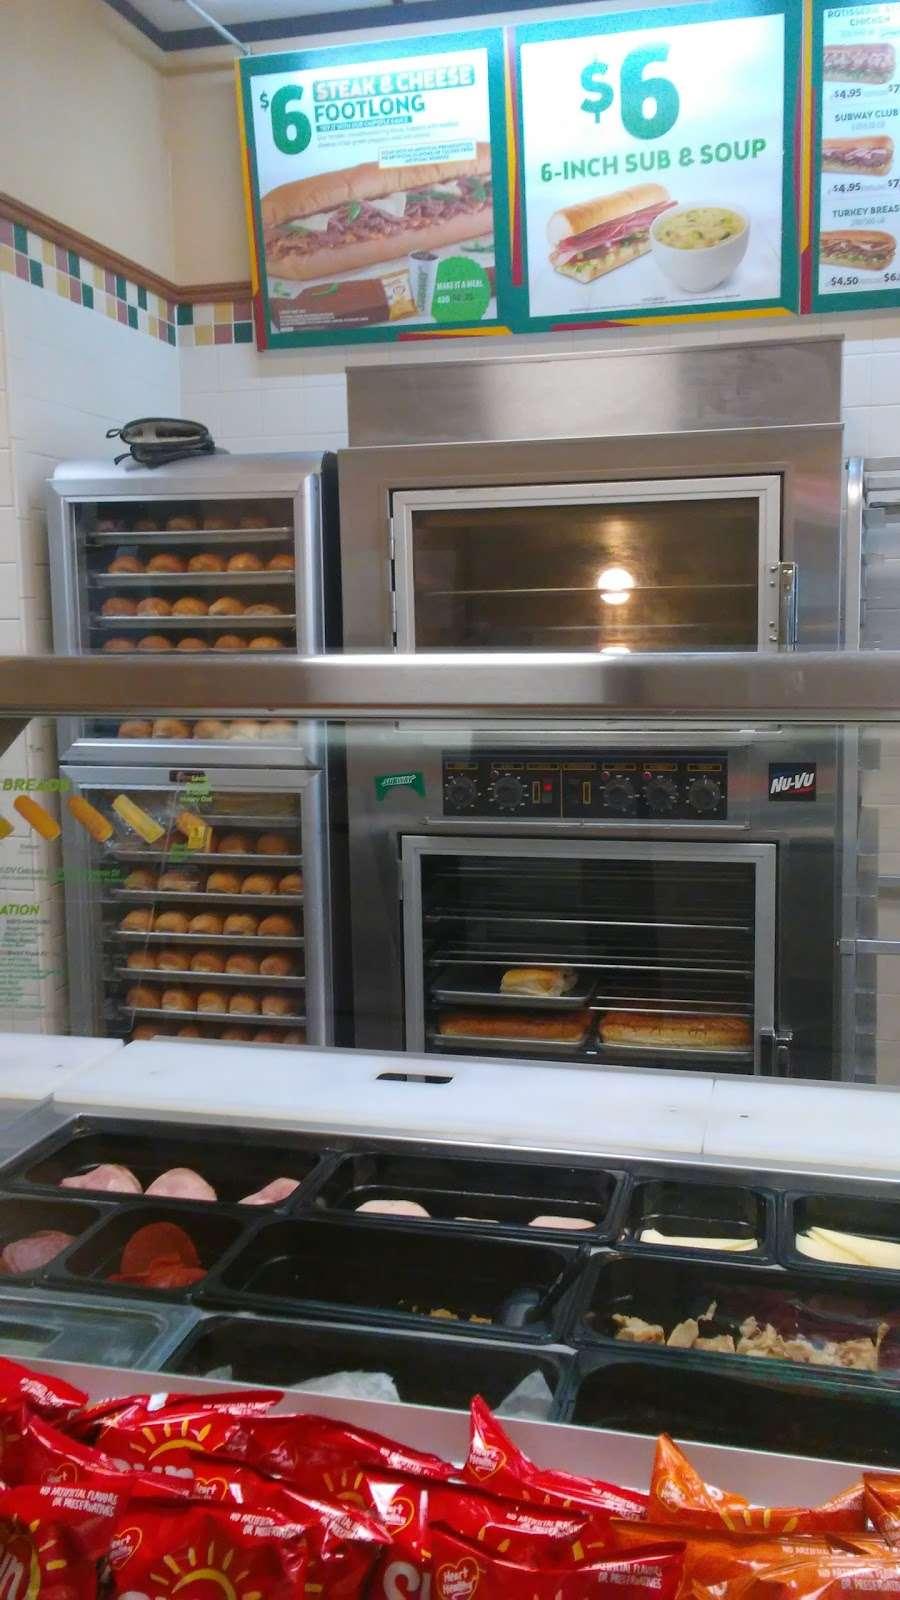 Subway Restaurants - restaurant    Photo 3 of 5   Address: 2263 Northpark Dr, Kingwood, TX 77339, USA   Phone: (281) 358-2199